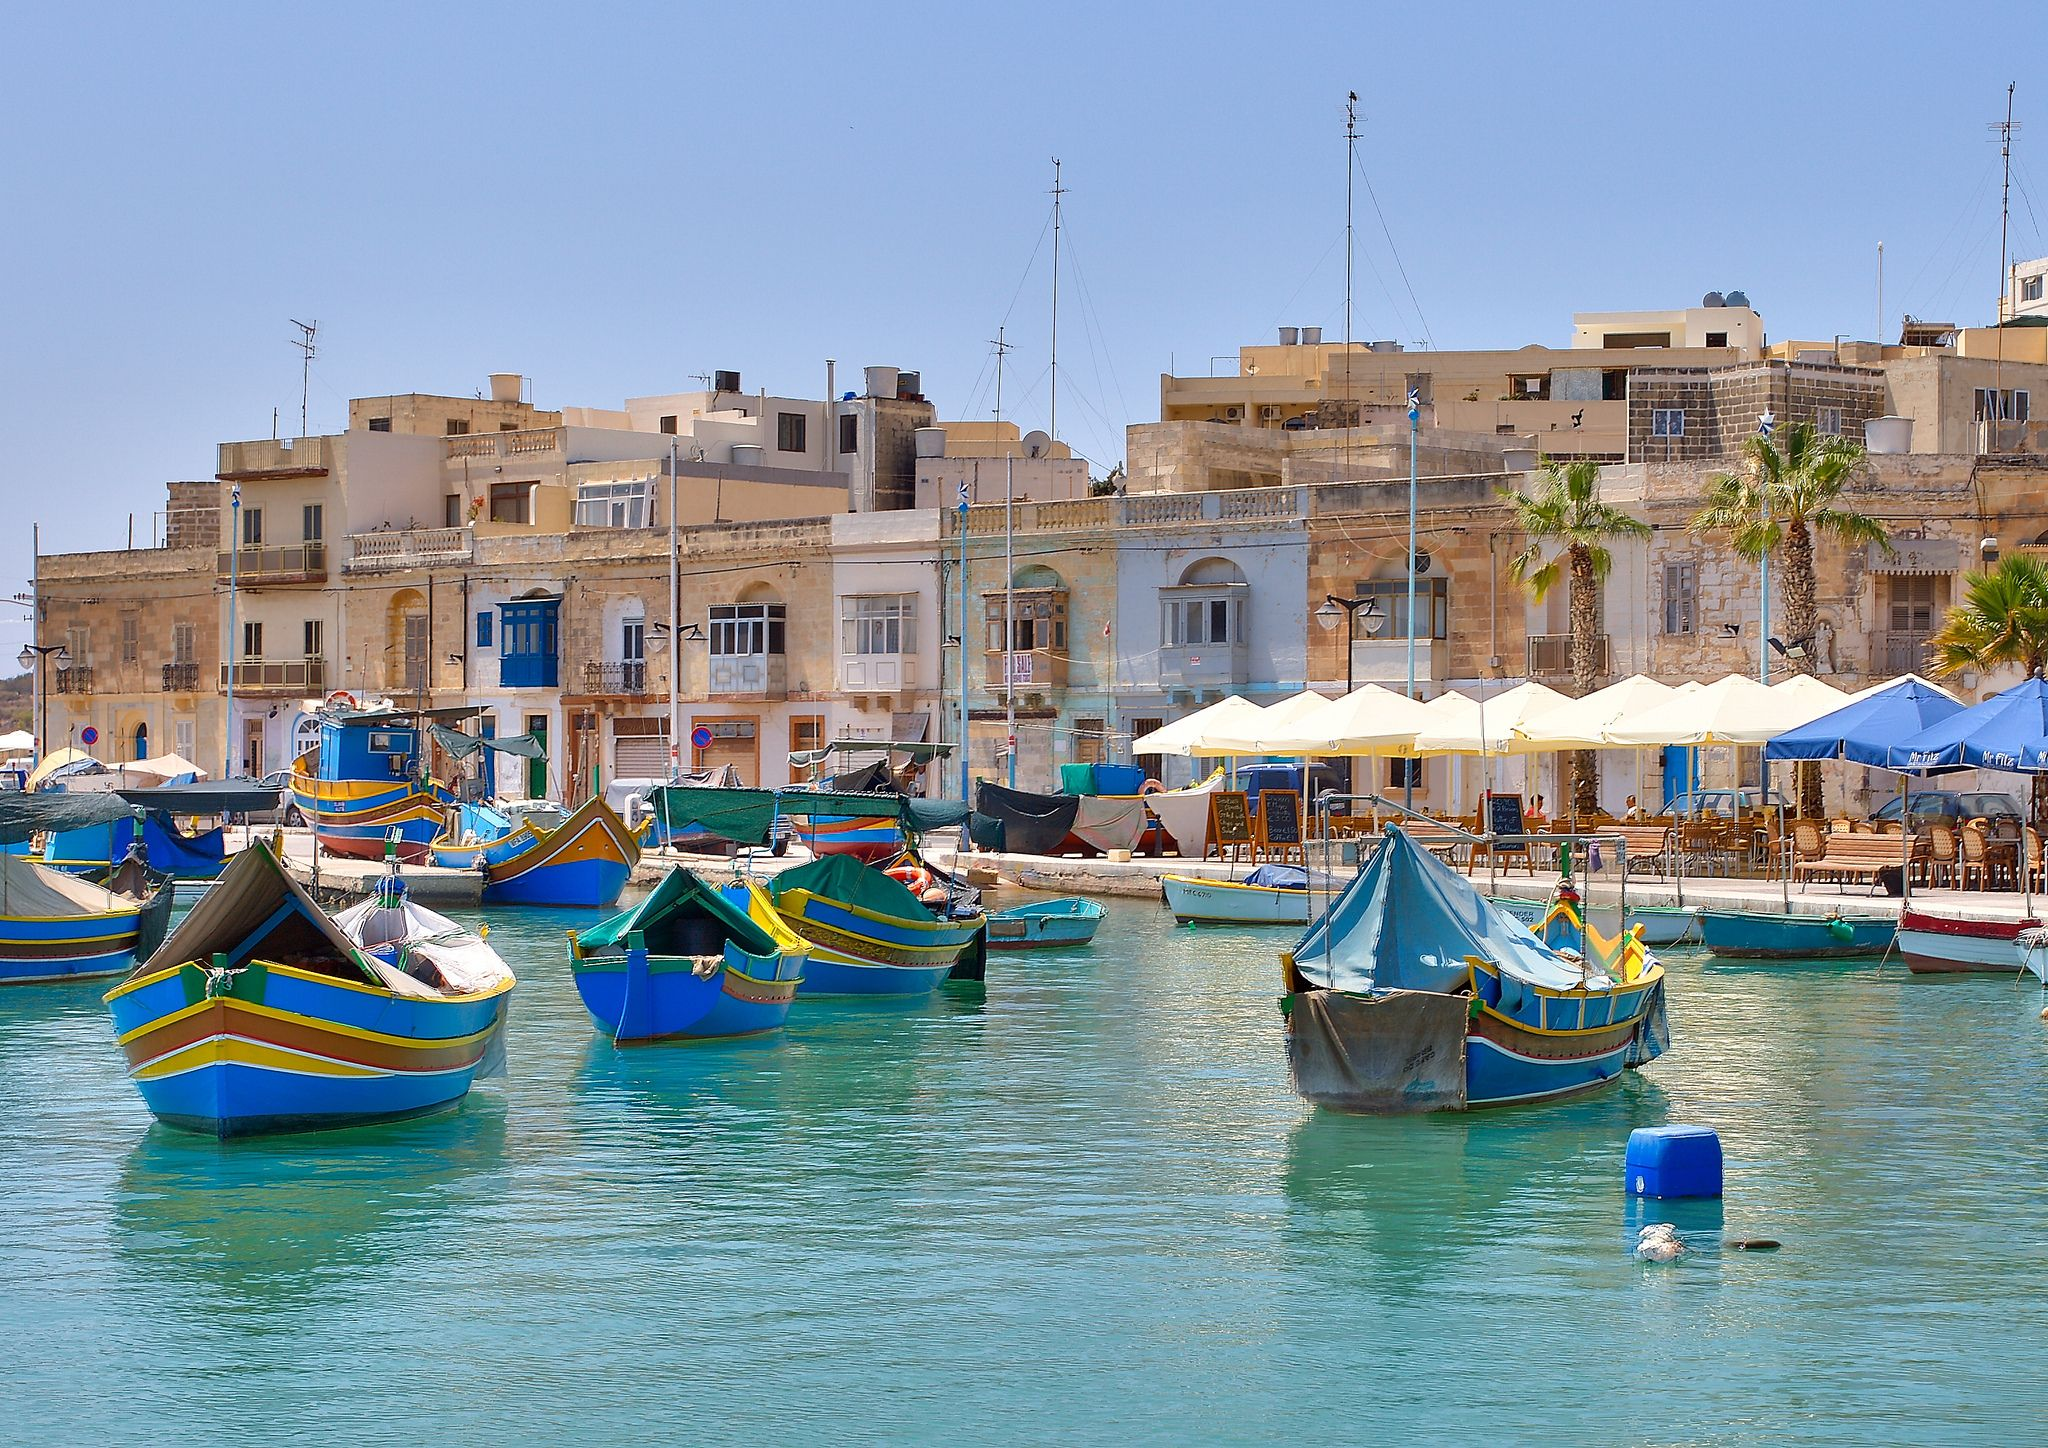 「malta marsaxlokk」の画像検索結果